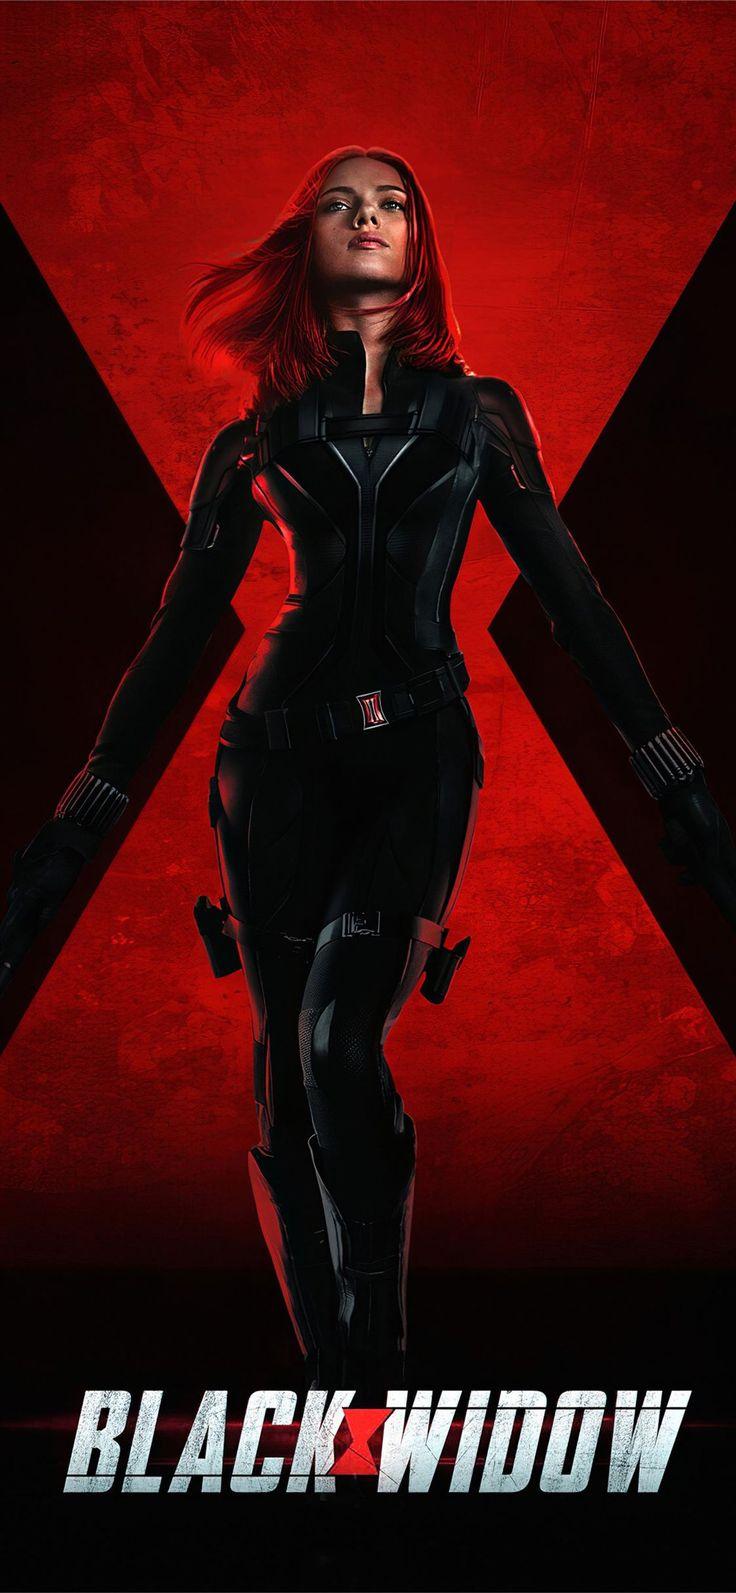 black widow 2020 4k movie blackwidow movies 2020Movies